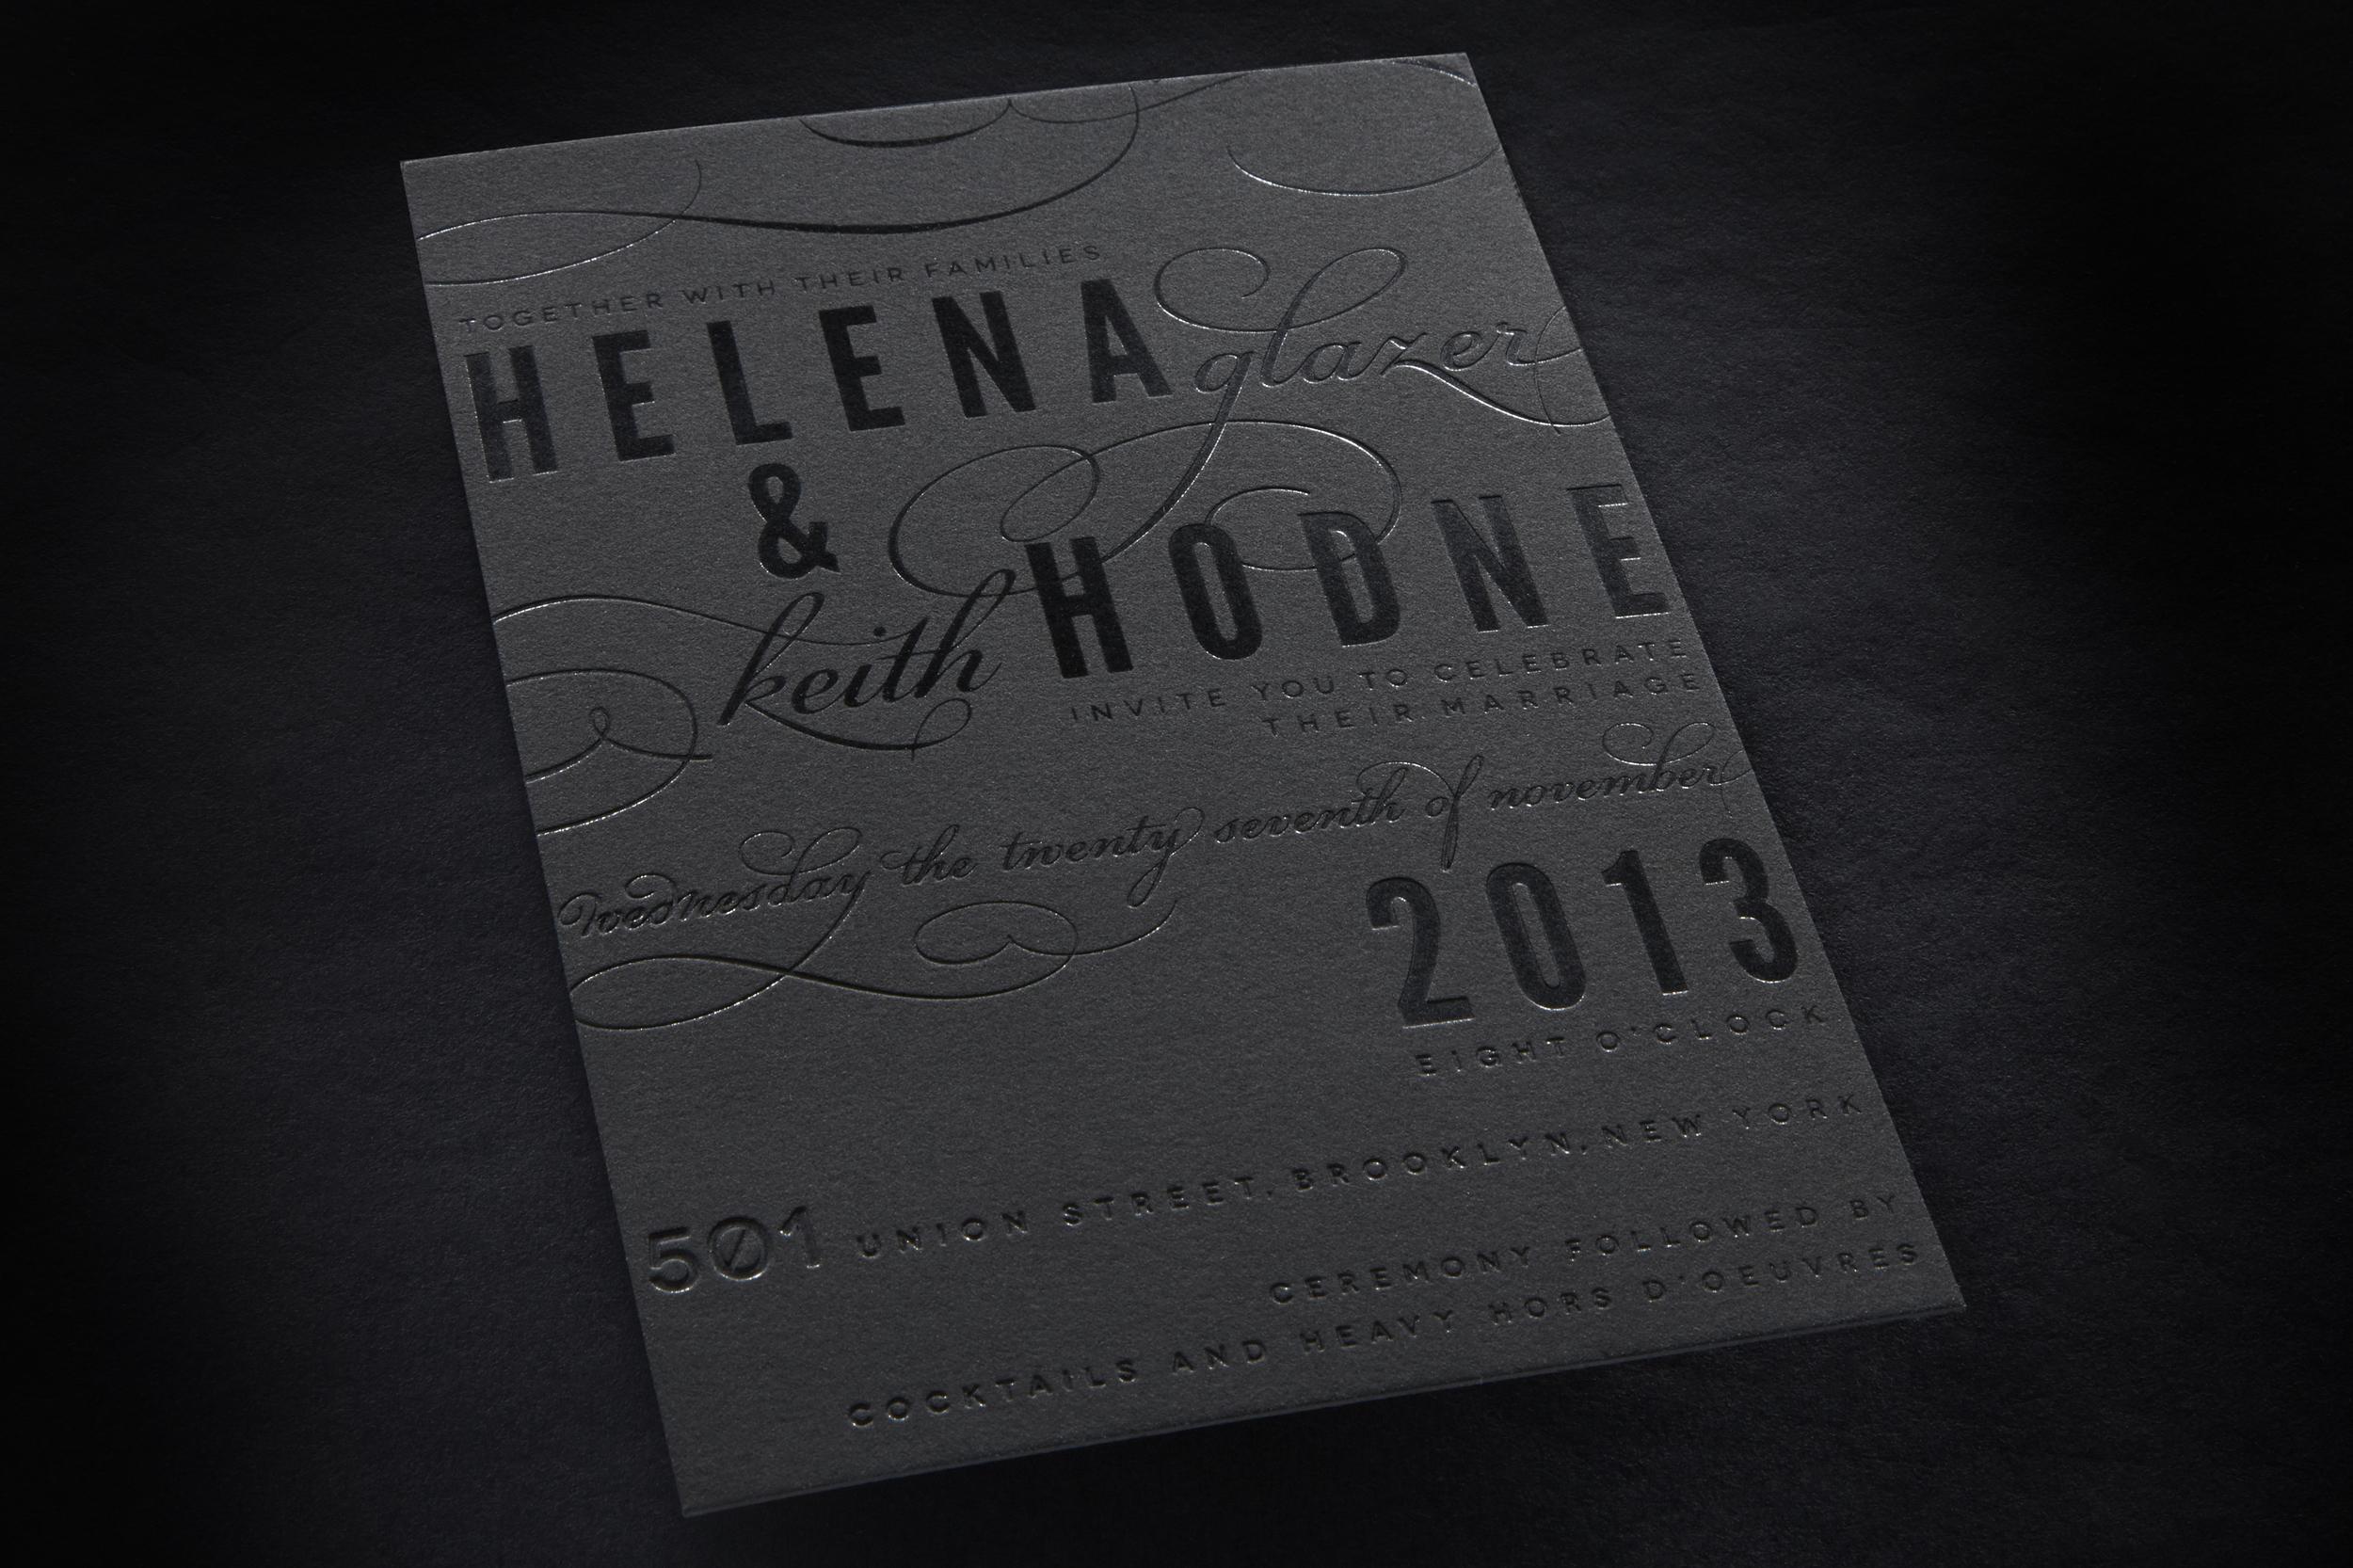 HELENA & KEITH